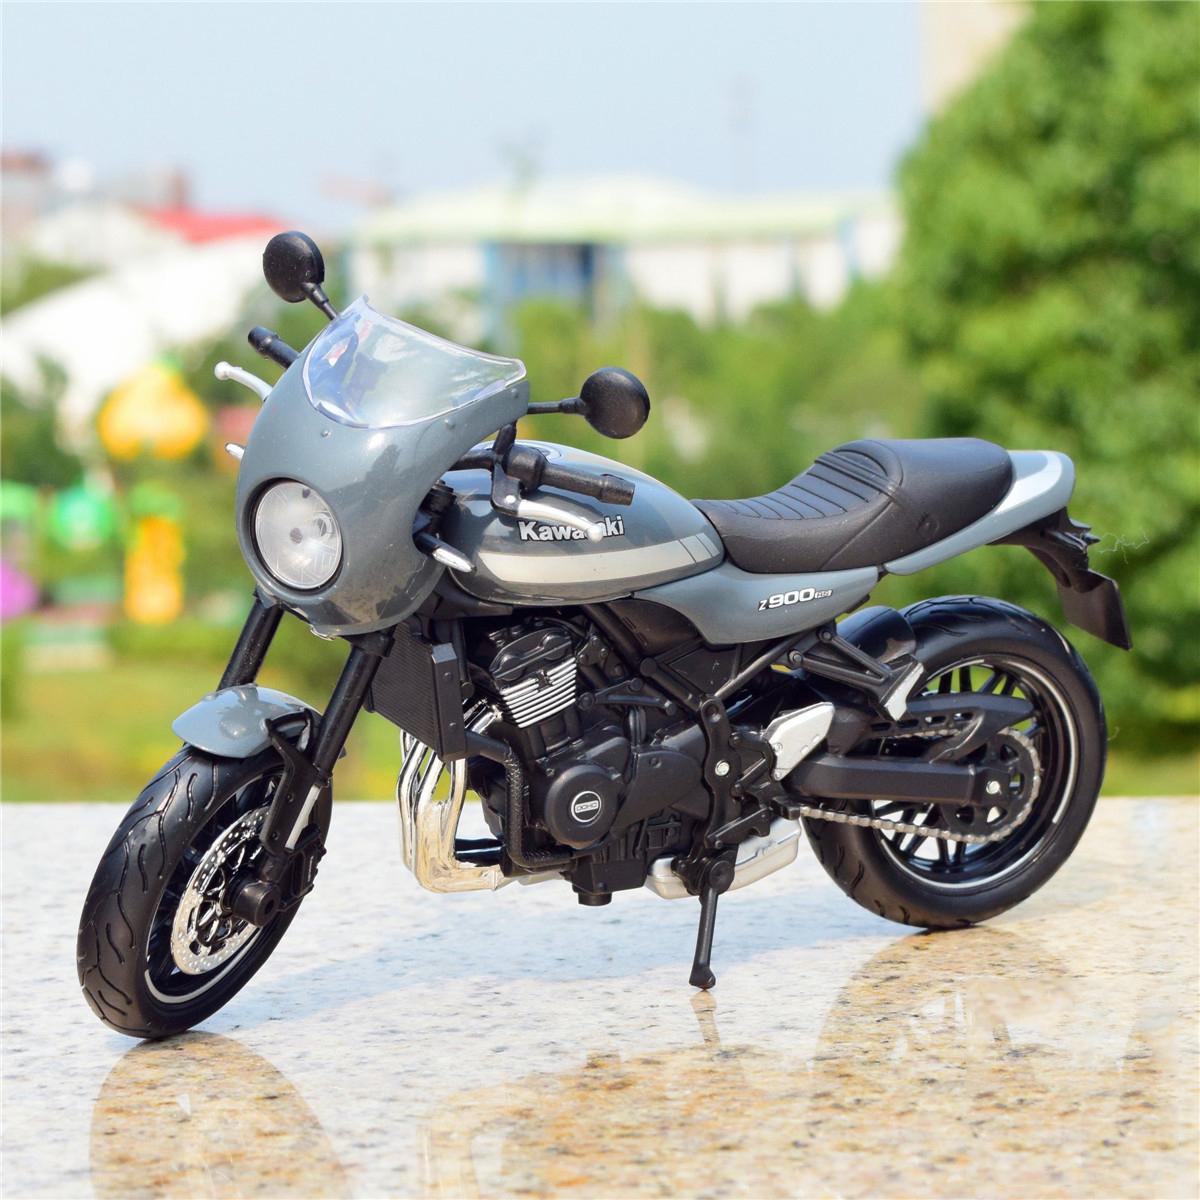 Kawasaki Z900rs Retro Imminent: Kawasaki Z900RS Cafe 1:12 Diecast Model Bike Gray Vintage